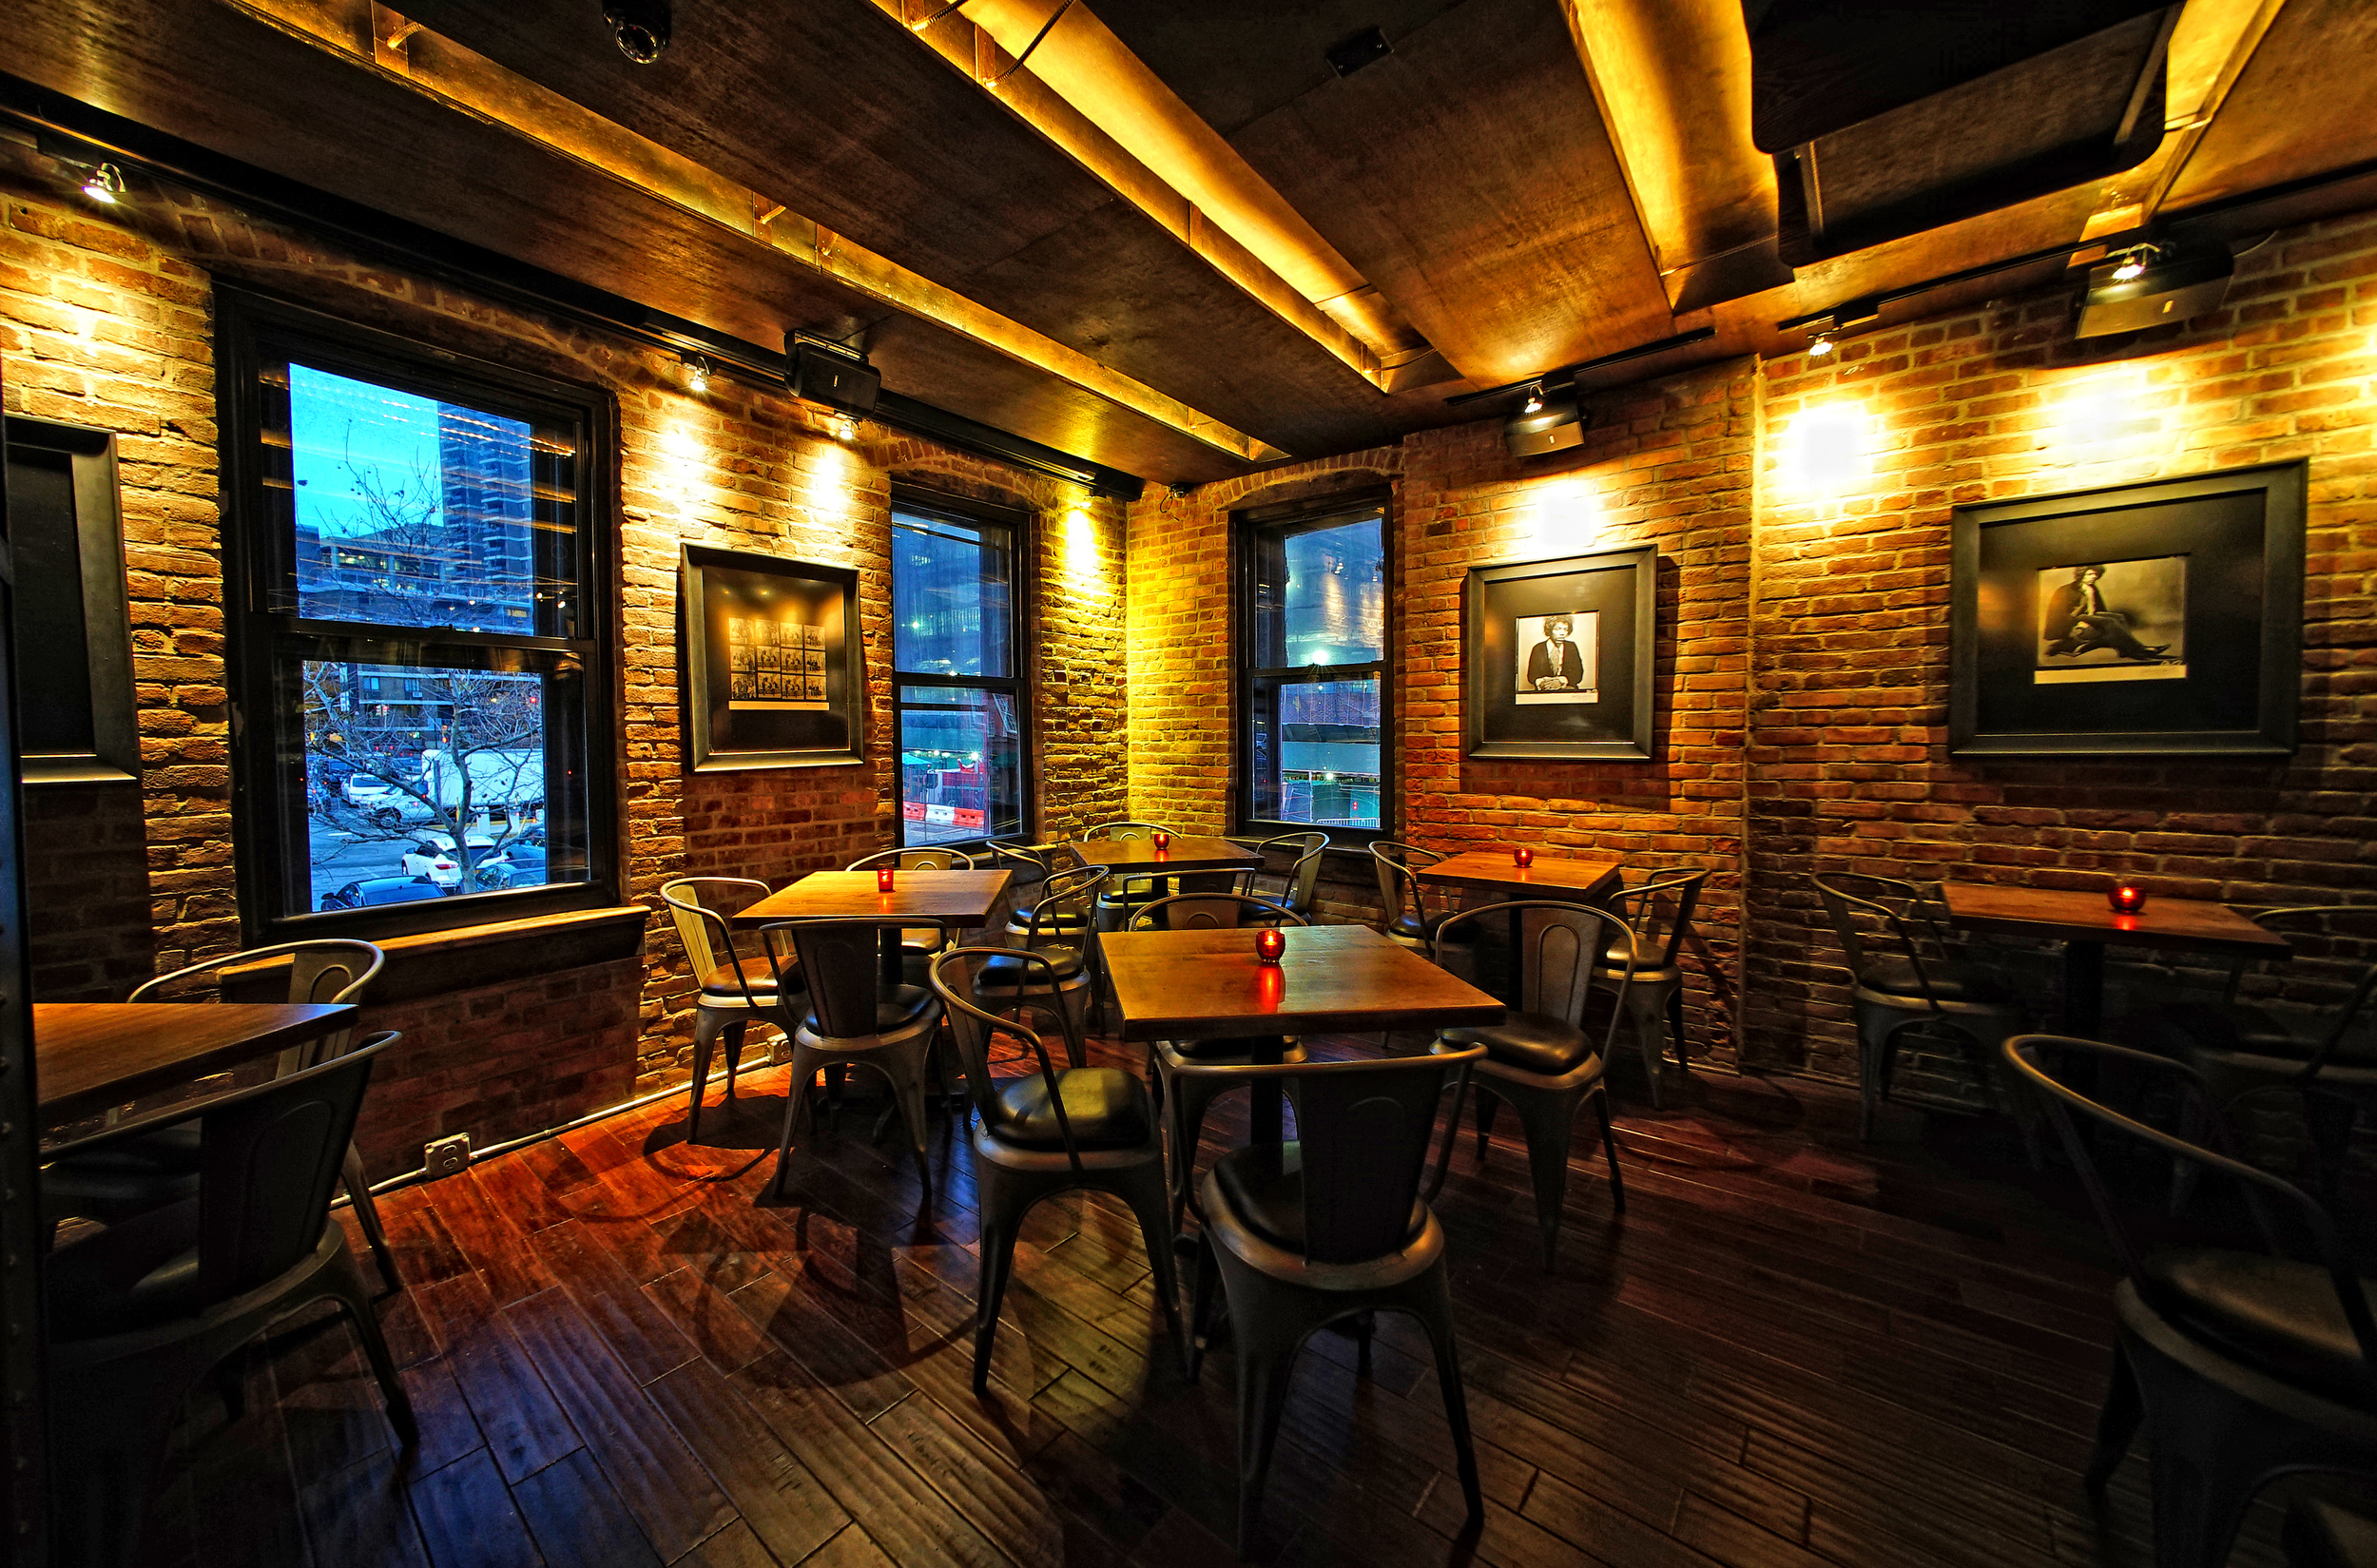 011, The Hideaway Seaport Restaurant and Bar.jpg